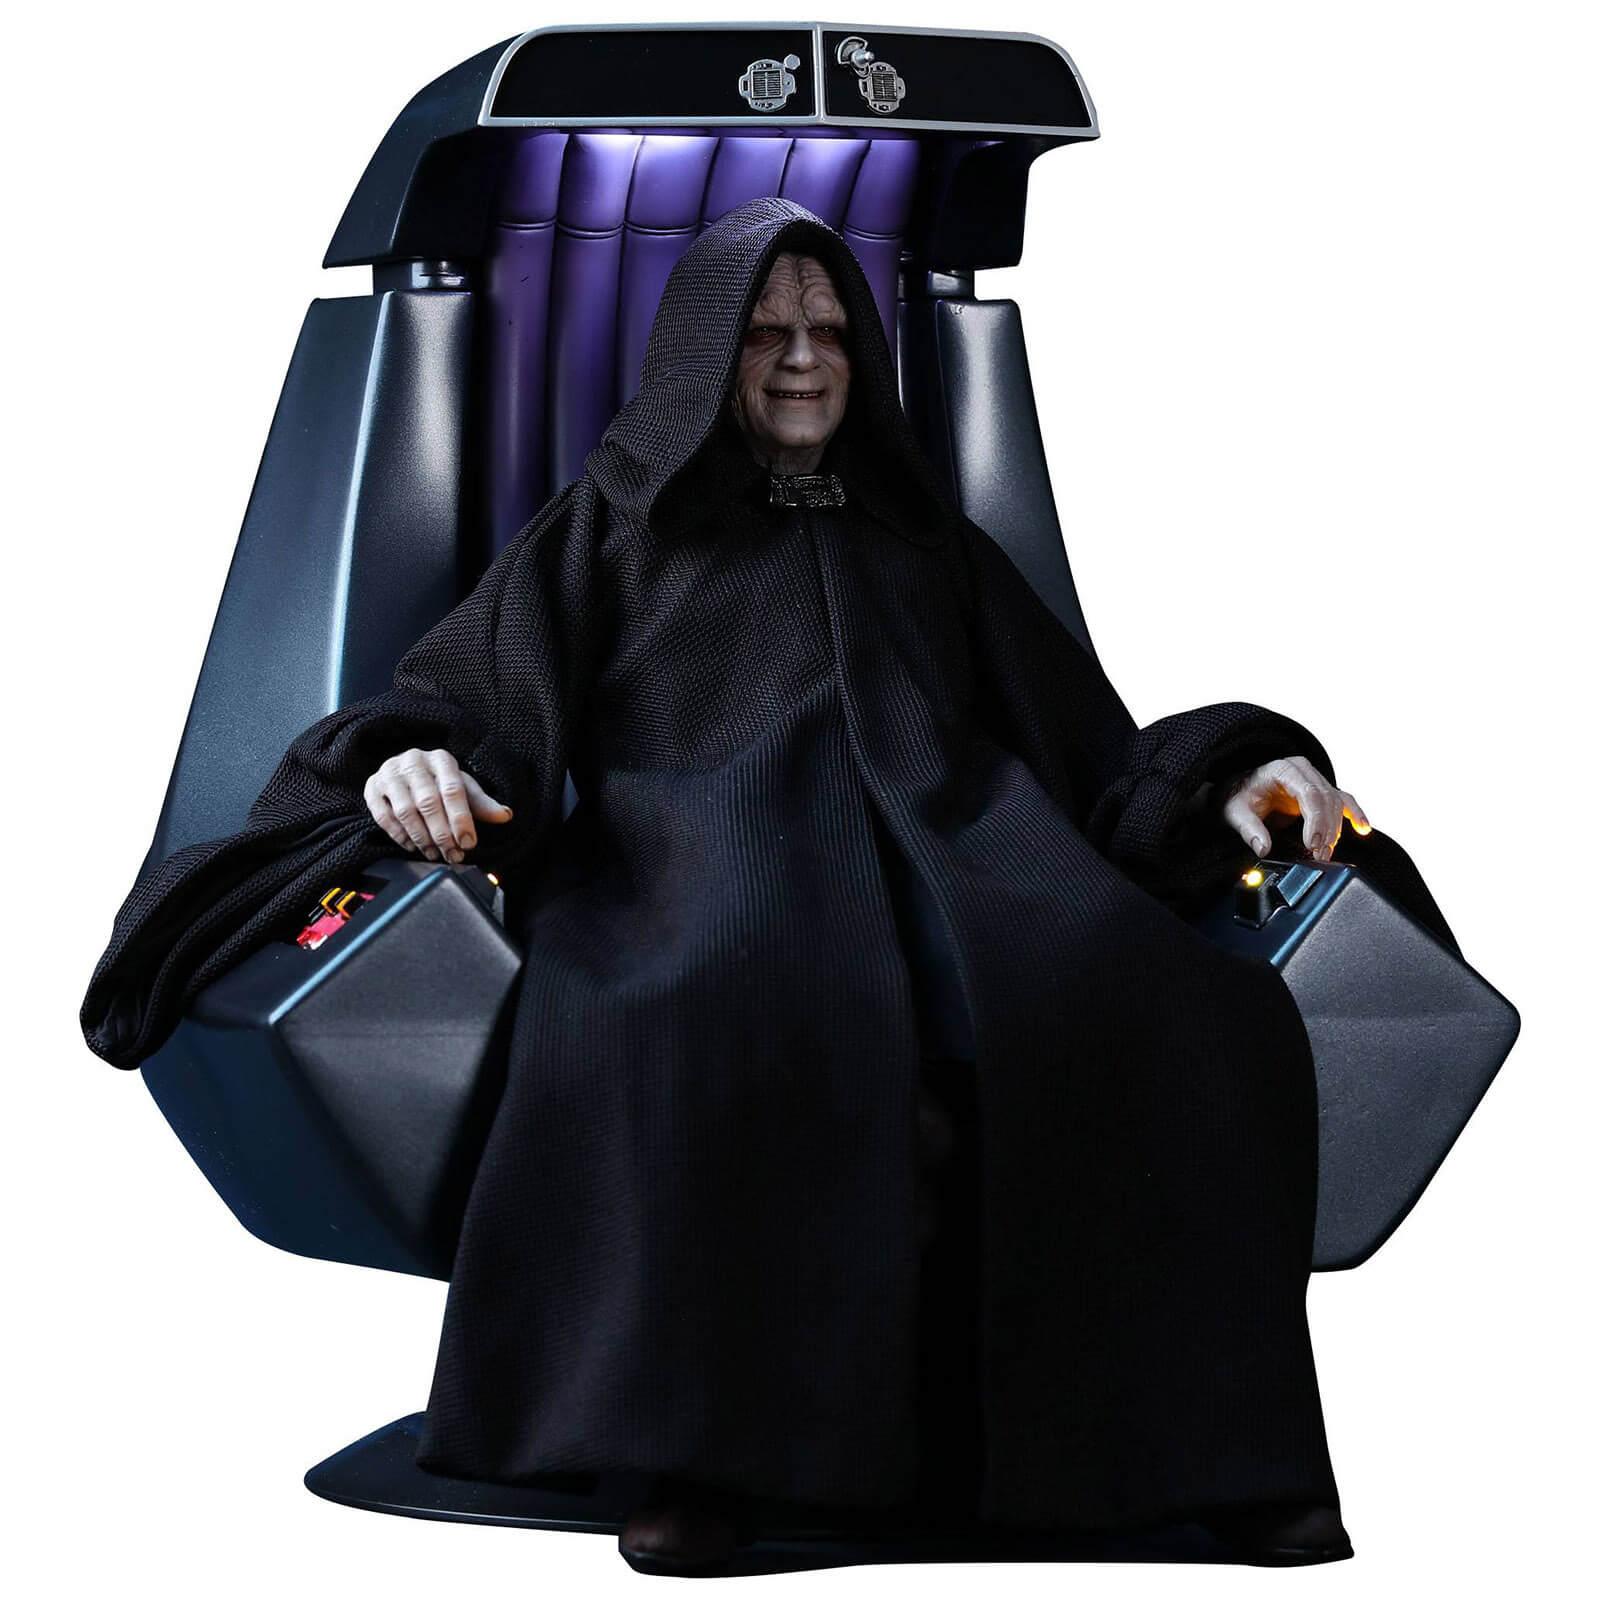 Hot Toys Star Wars Episode Vi Movie Masterpiece Action Figure 1 6 Emperor Palpatine Deluxe Version 29 Cm Merchandise Zavvi Us